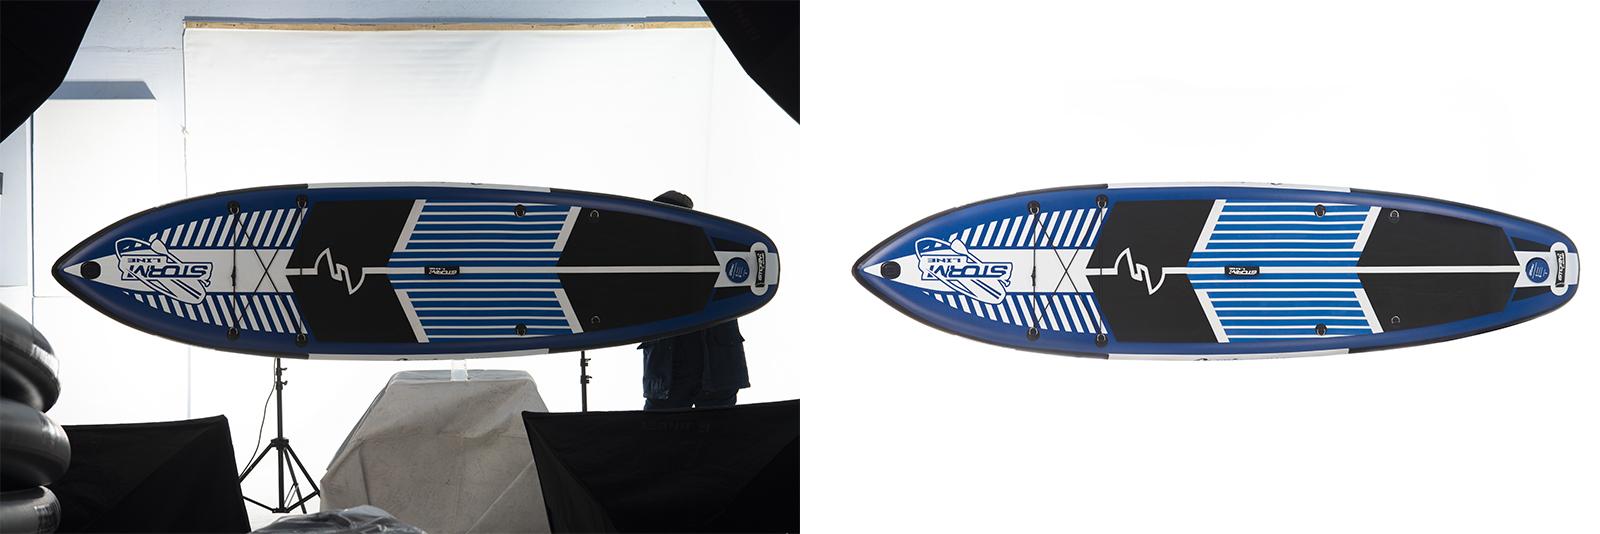 Обтравка и Ретушь Лодка 1